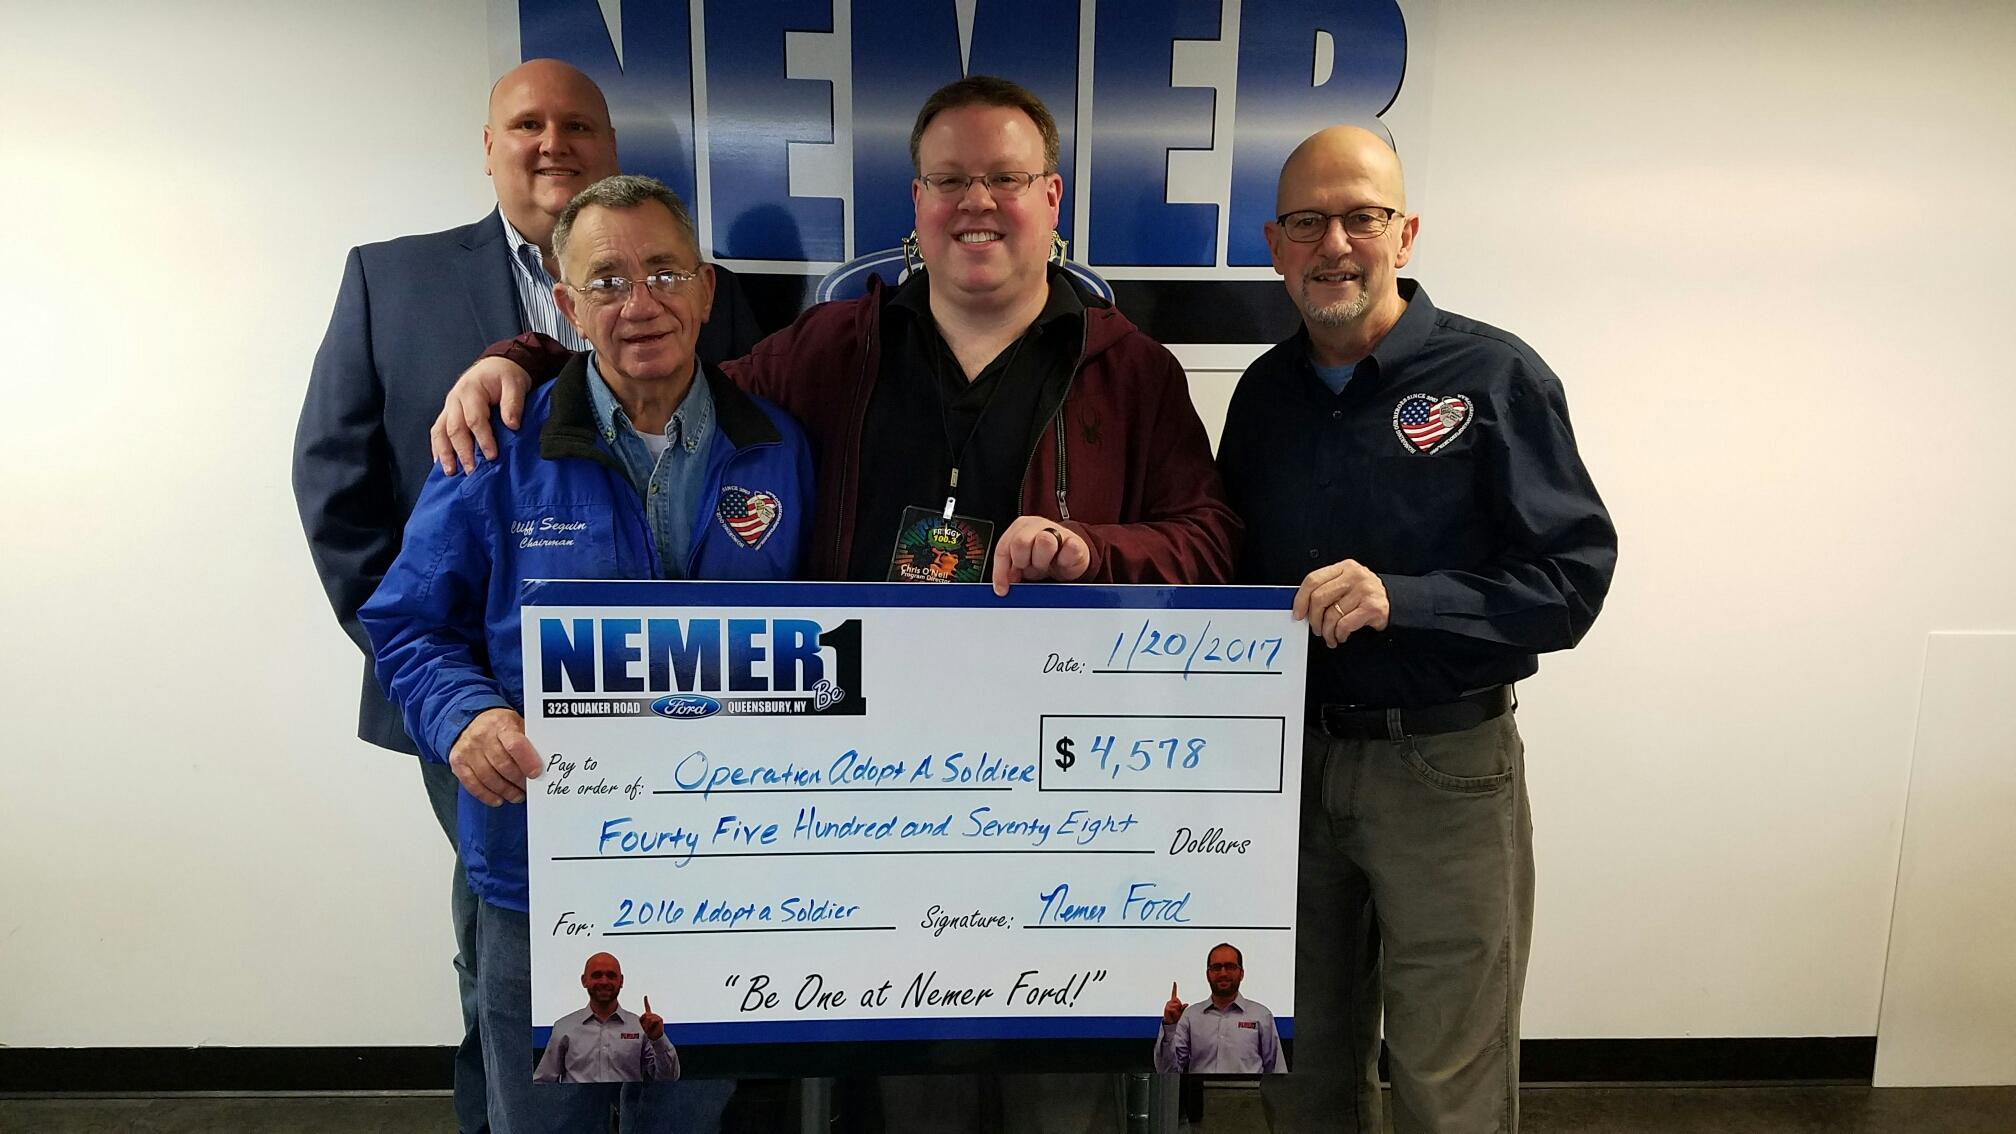 Thank You To Nemer Auto Group